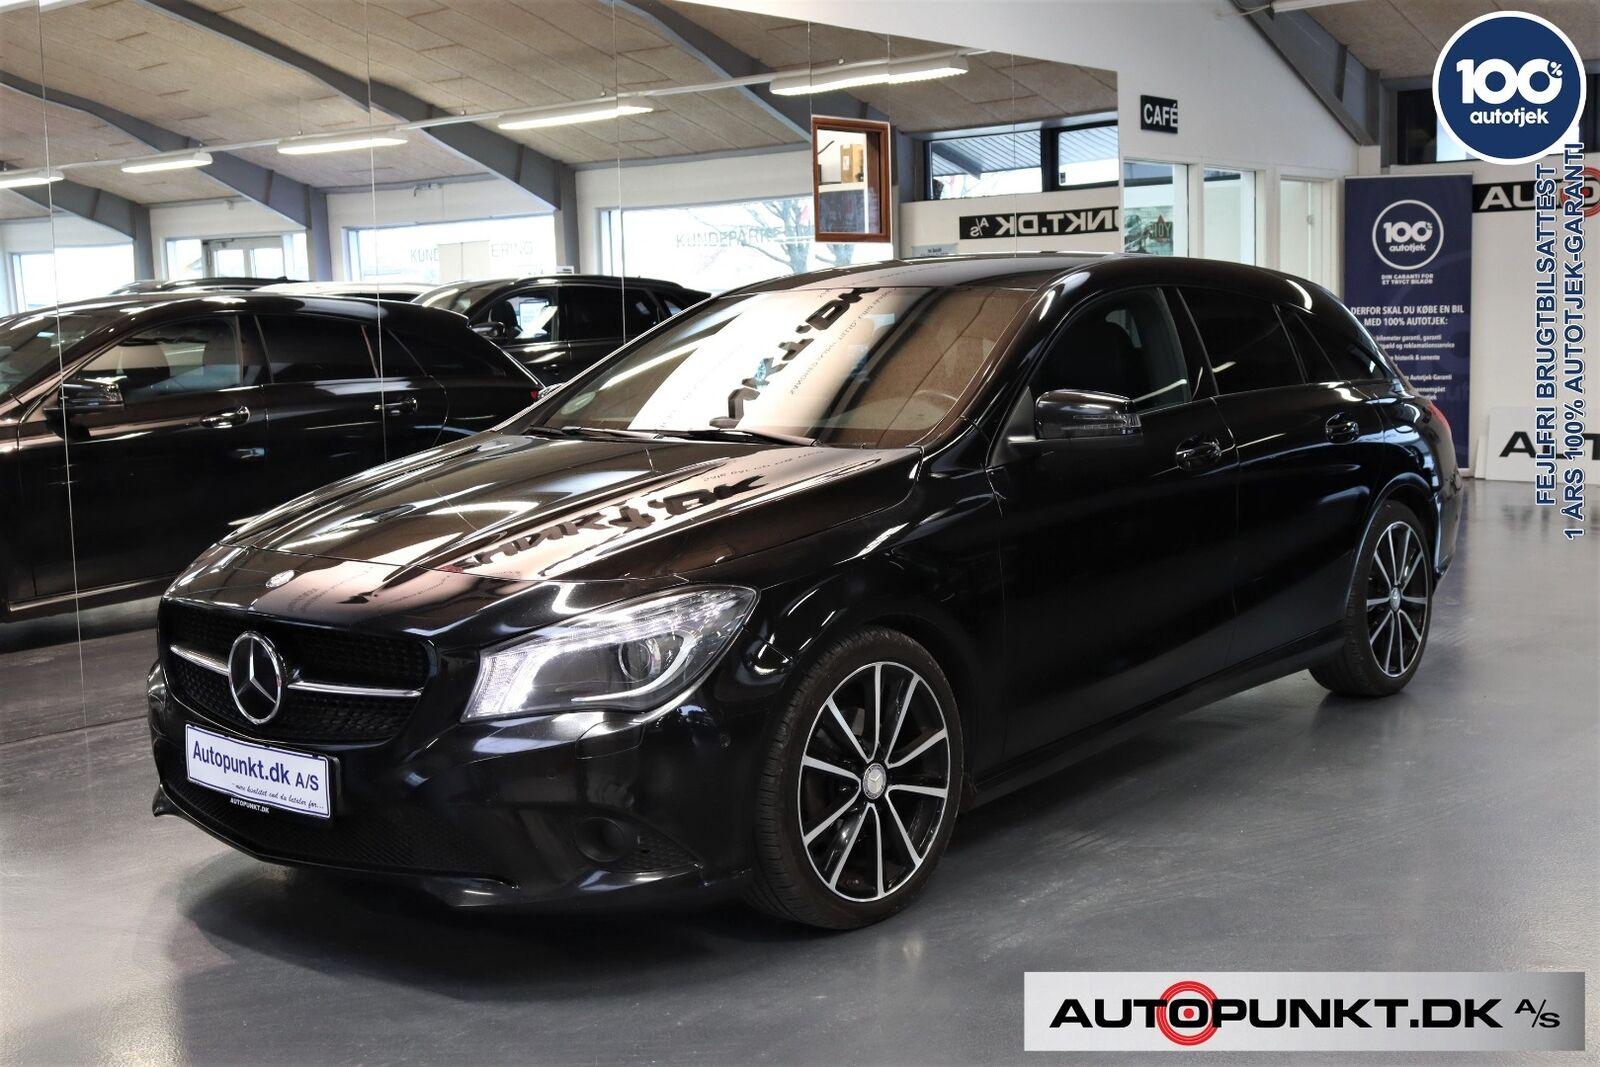 Mercedes CLA220 2,2 CDi SB aut. 5d - 289.700 kr.